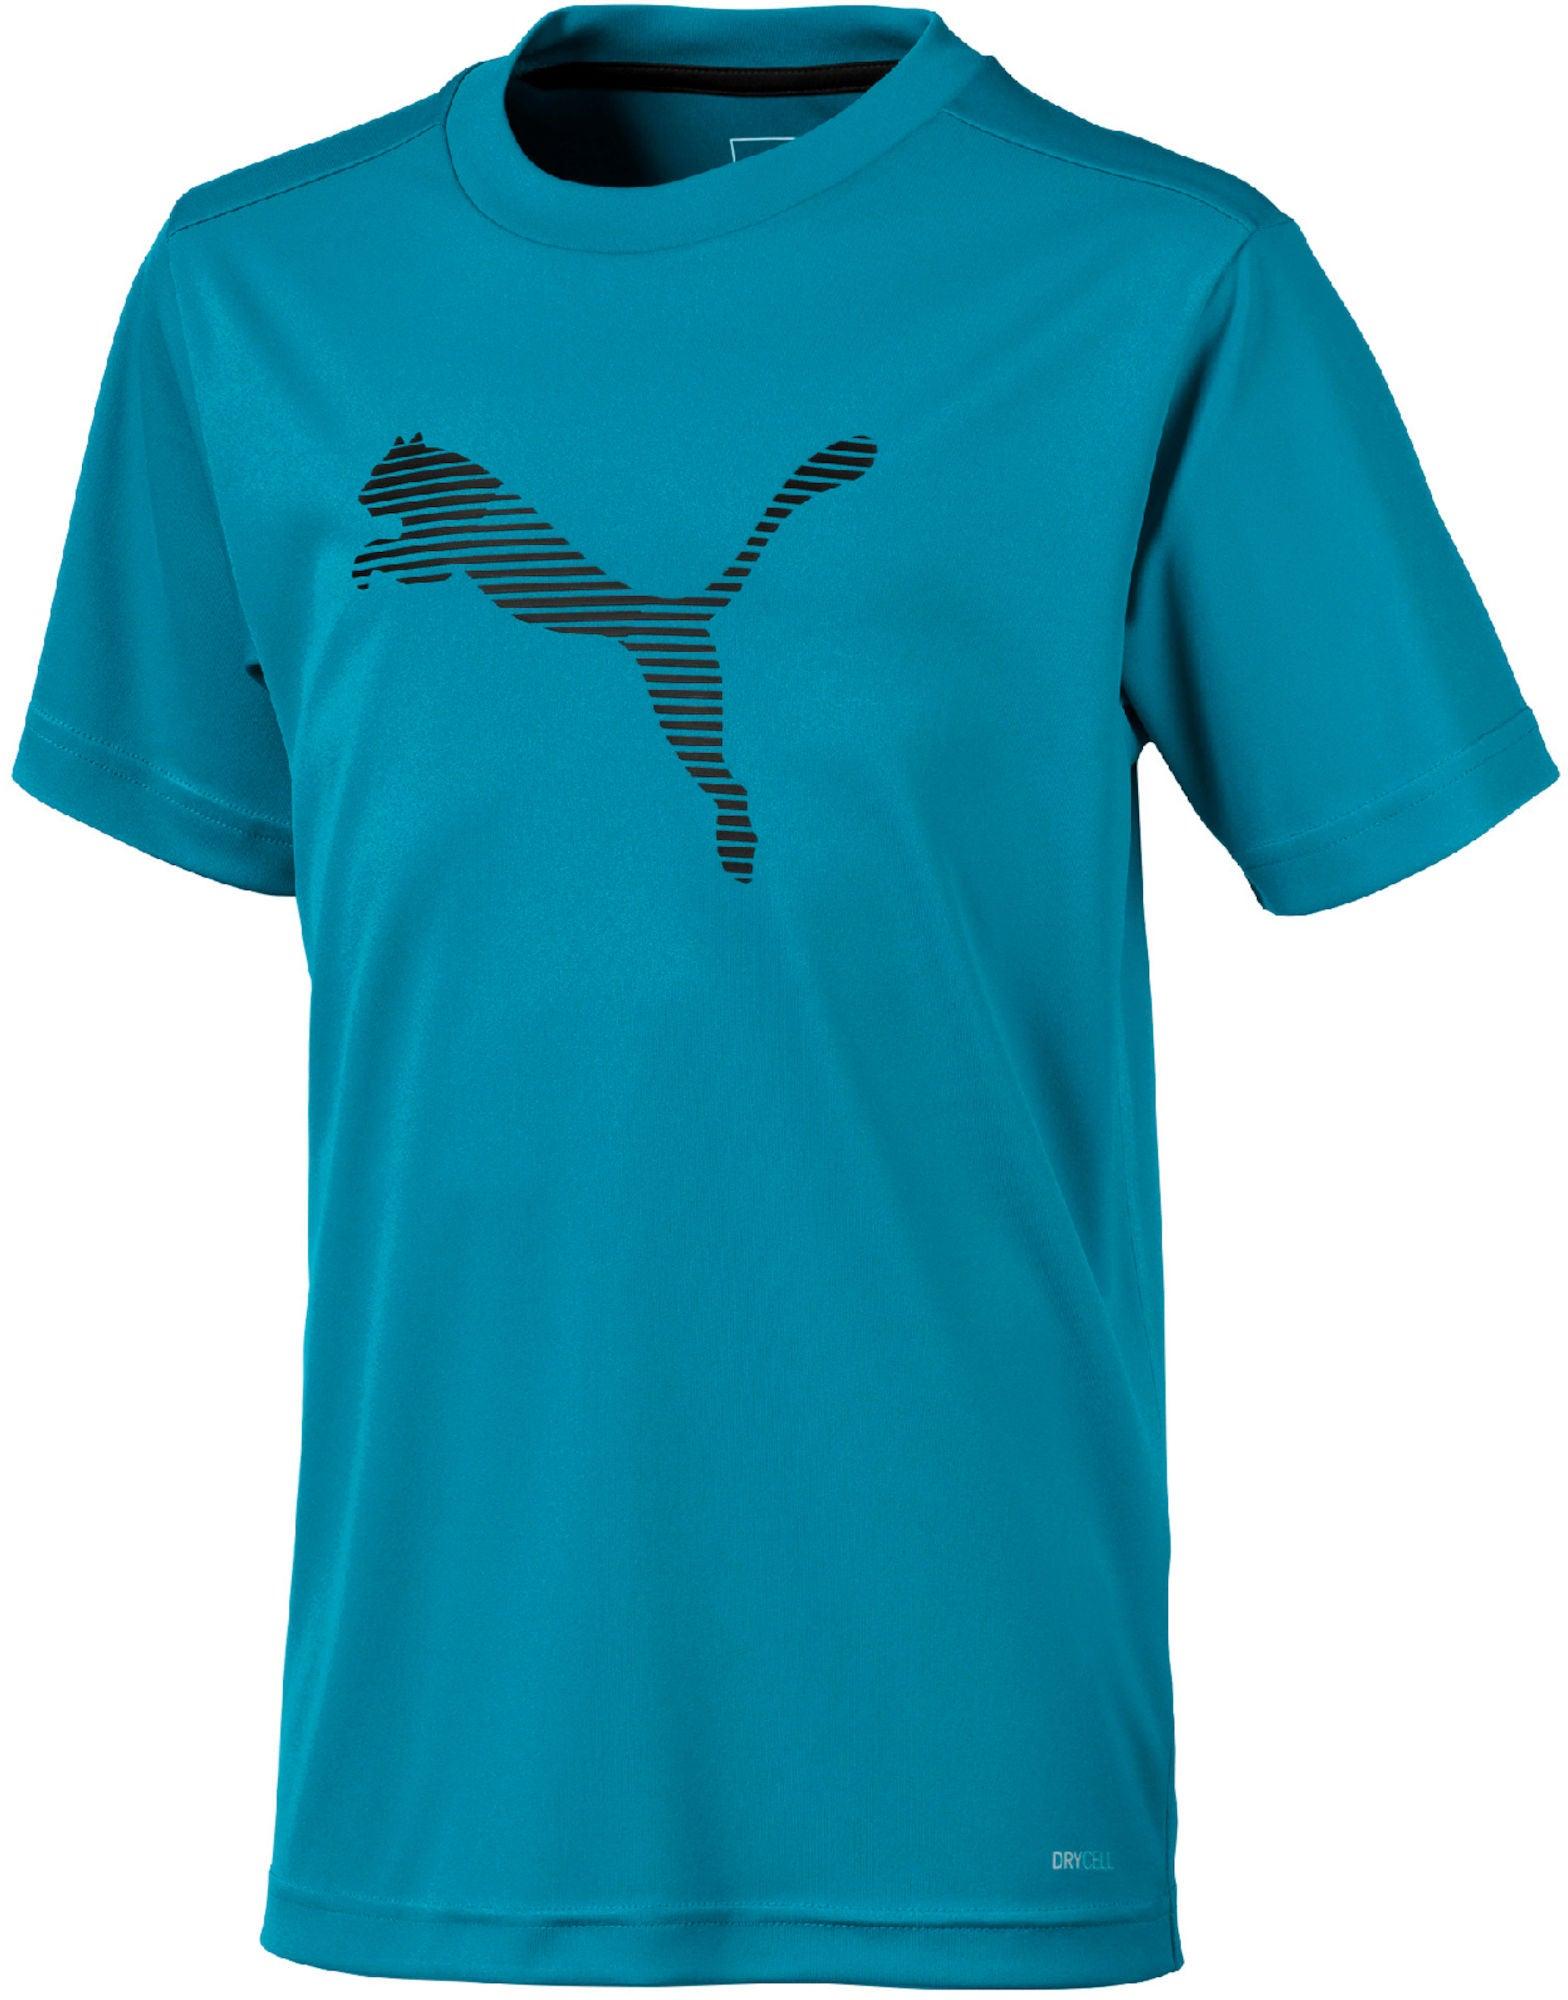 Kjøp Puma Ftblplay T skjorte, Caribbean | Jollyroom